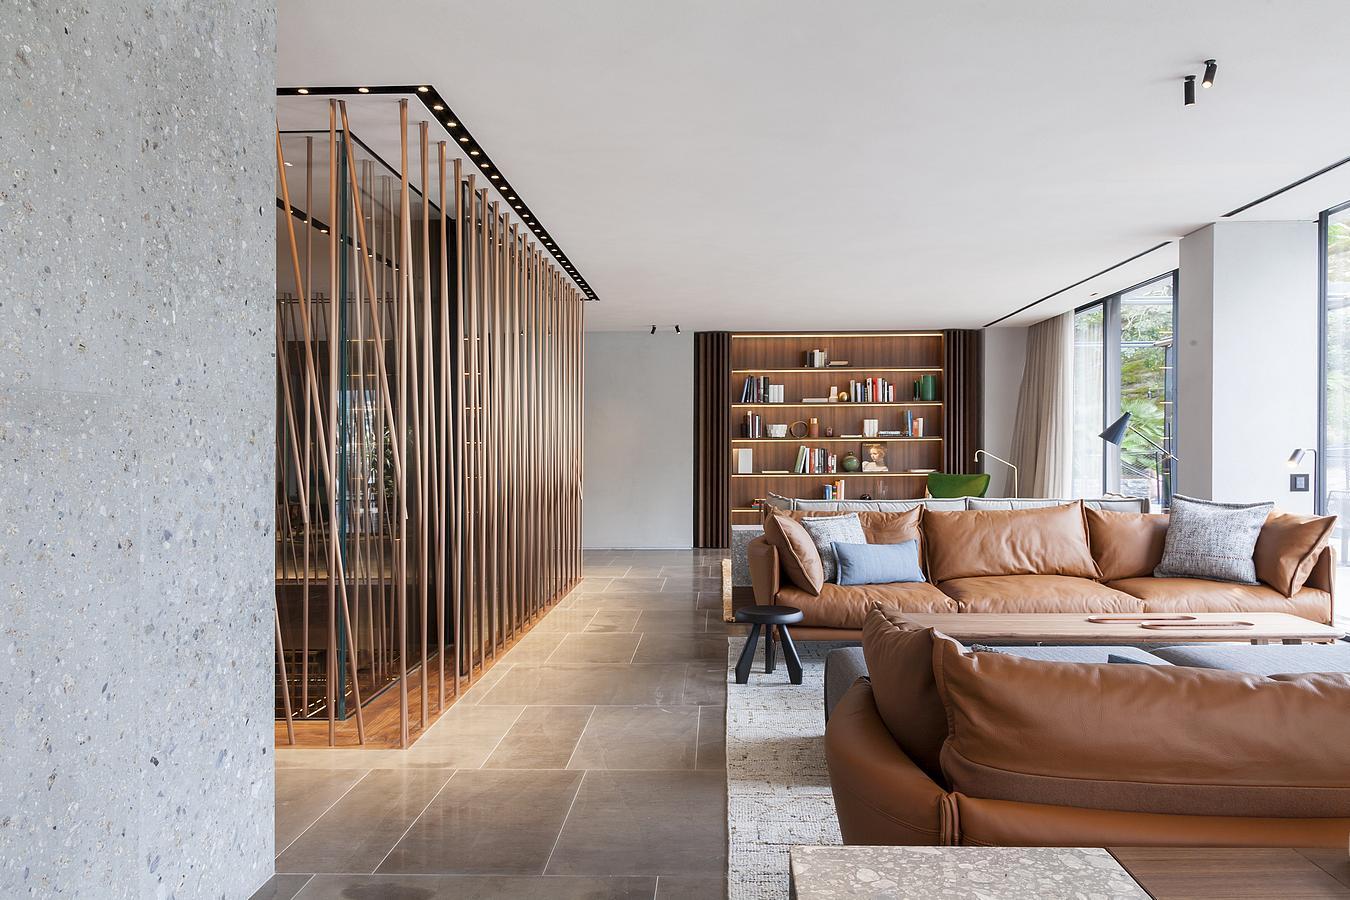 Patricia urquiola 39 s interior design for il sereno - Interior design ideas blog ...